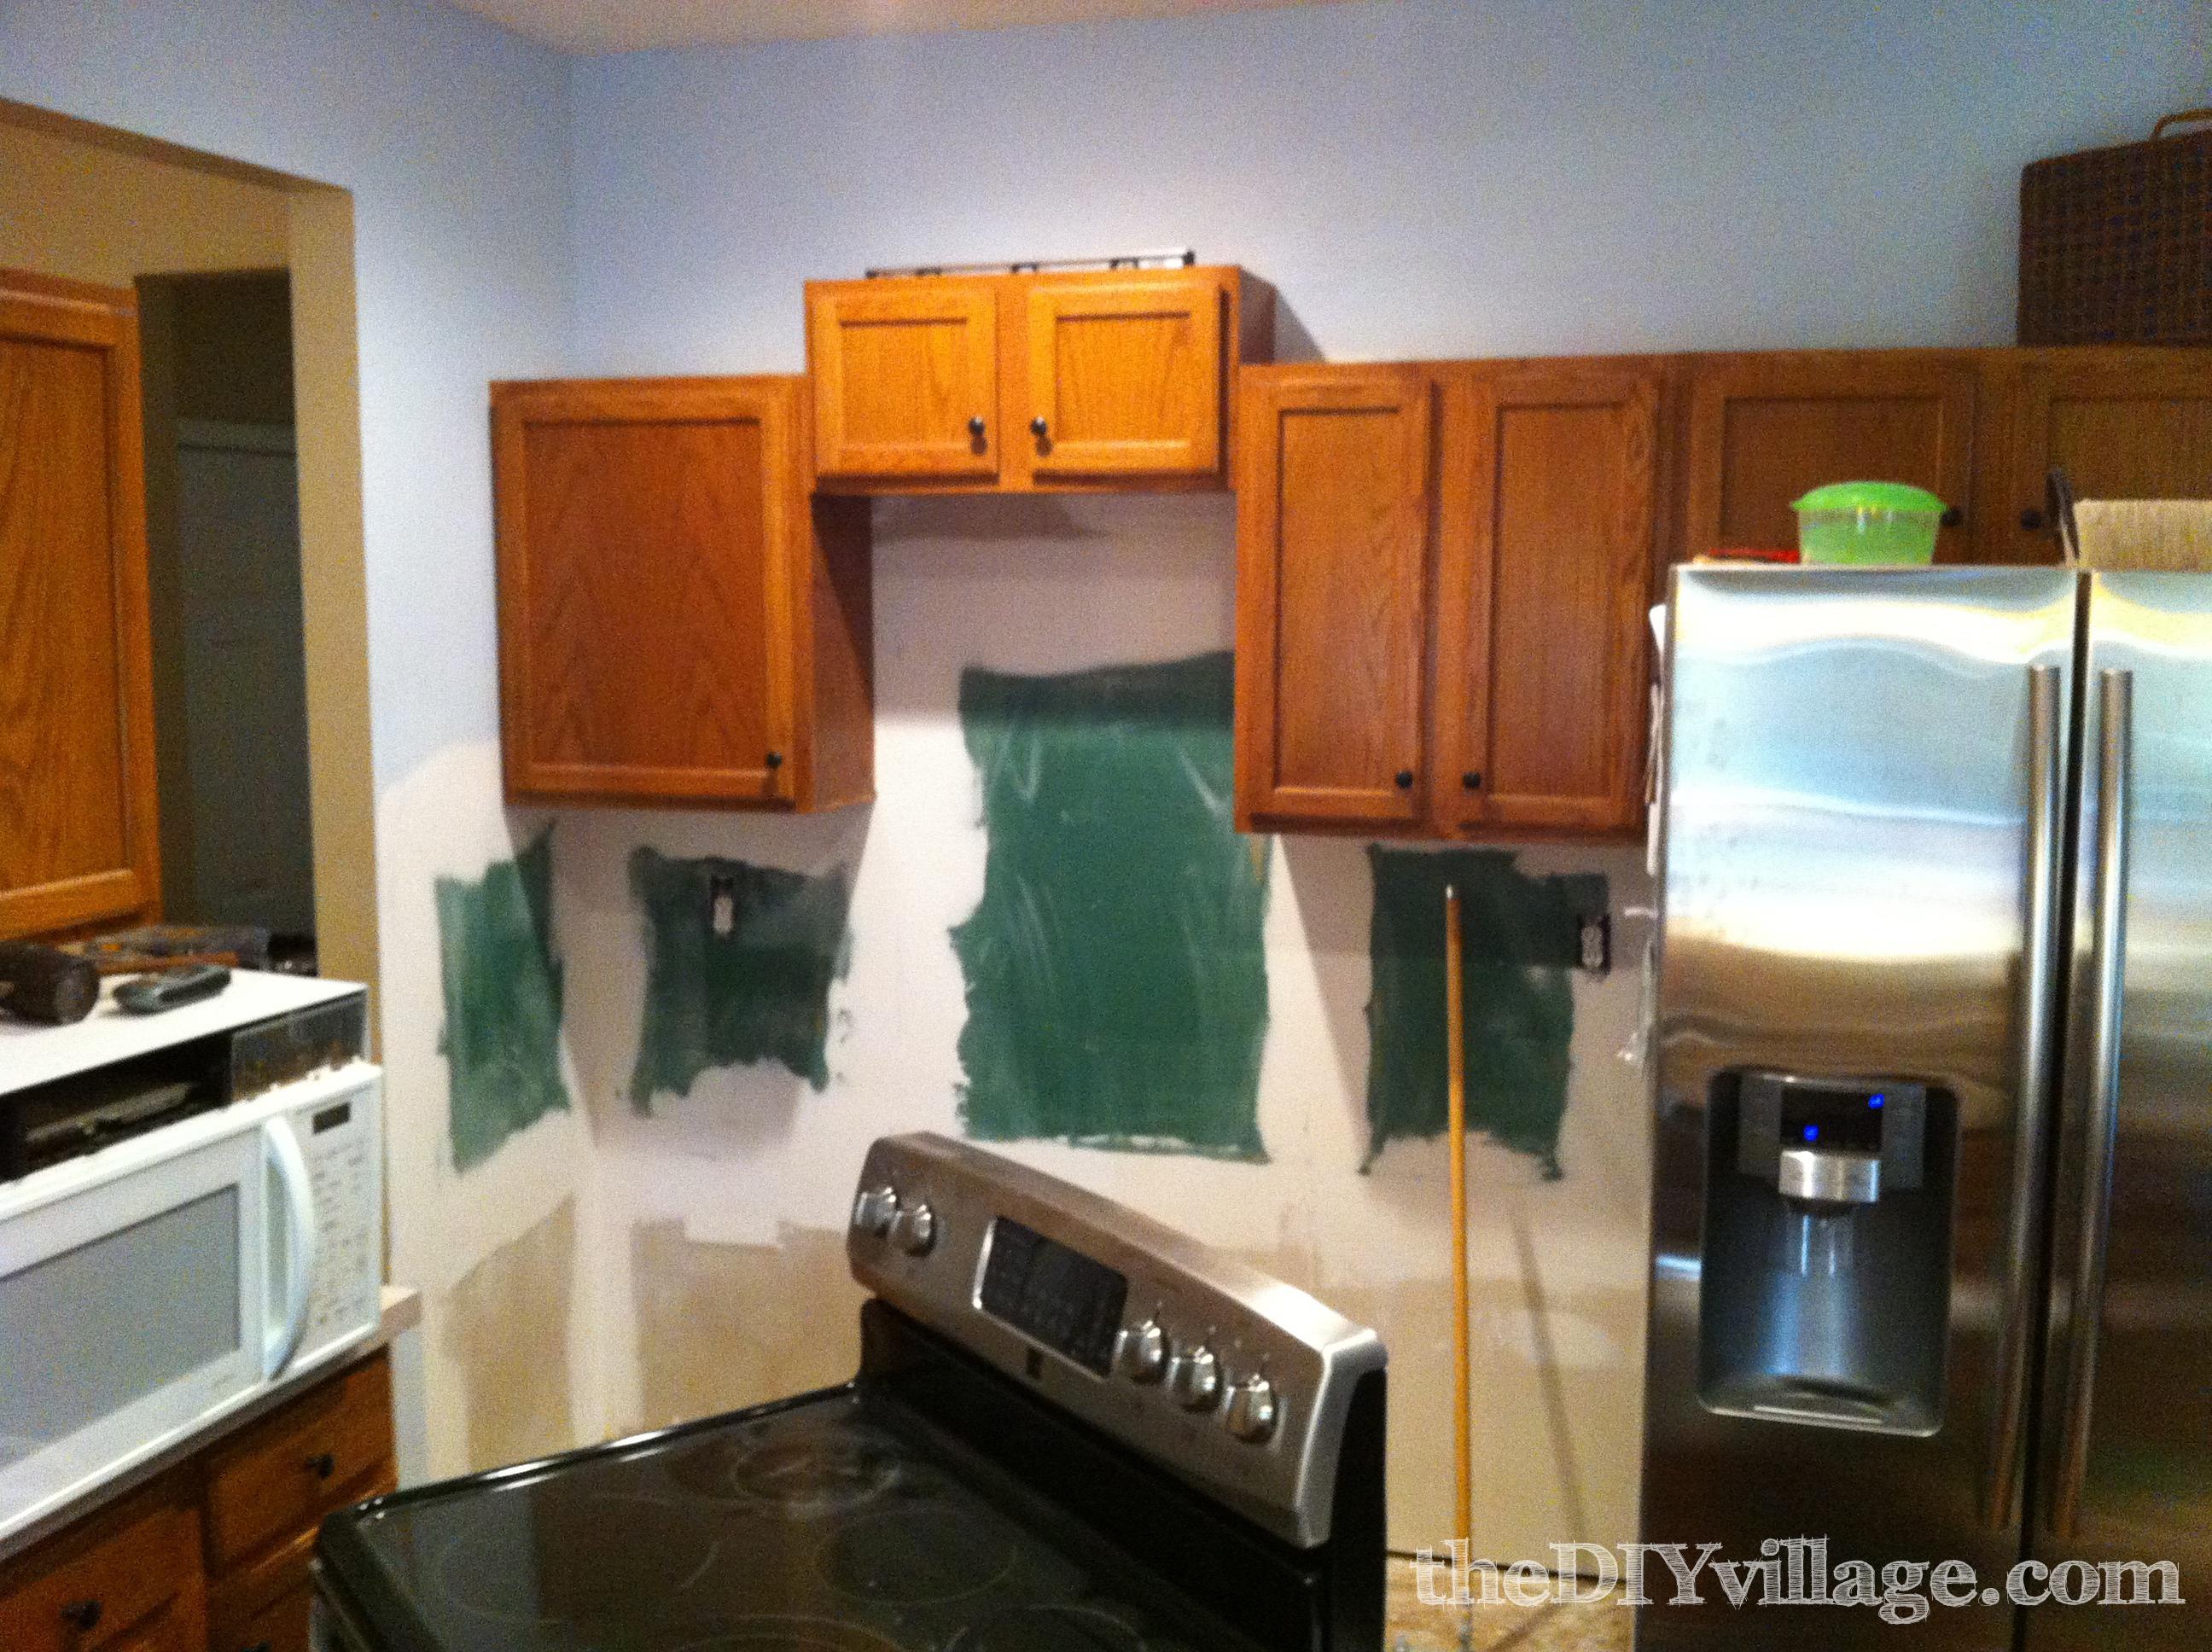 How To Install Cabinets In Kitchen Split Face Travertine Tile Backsplash The Diy Village